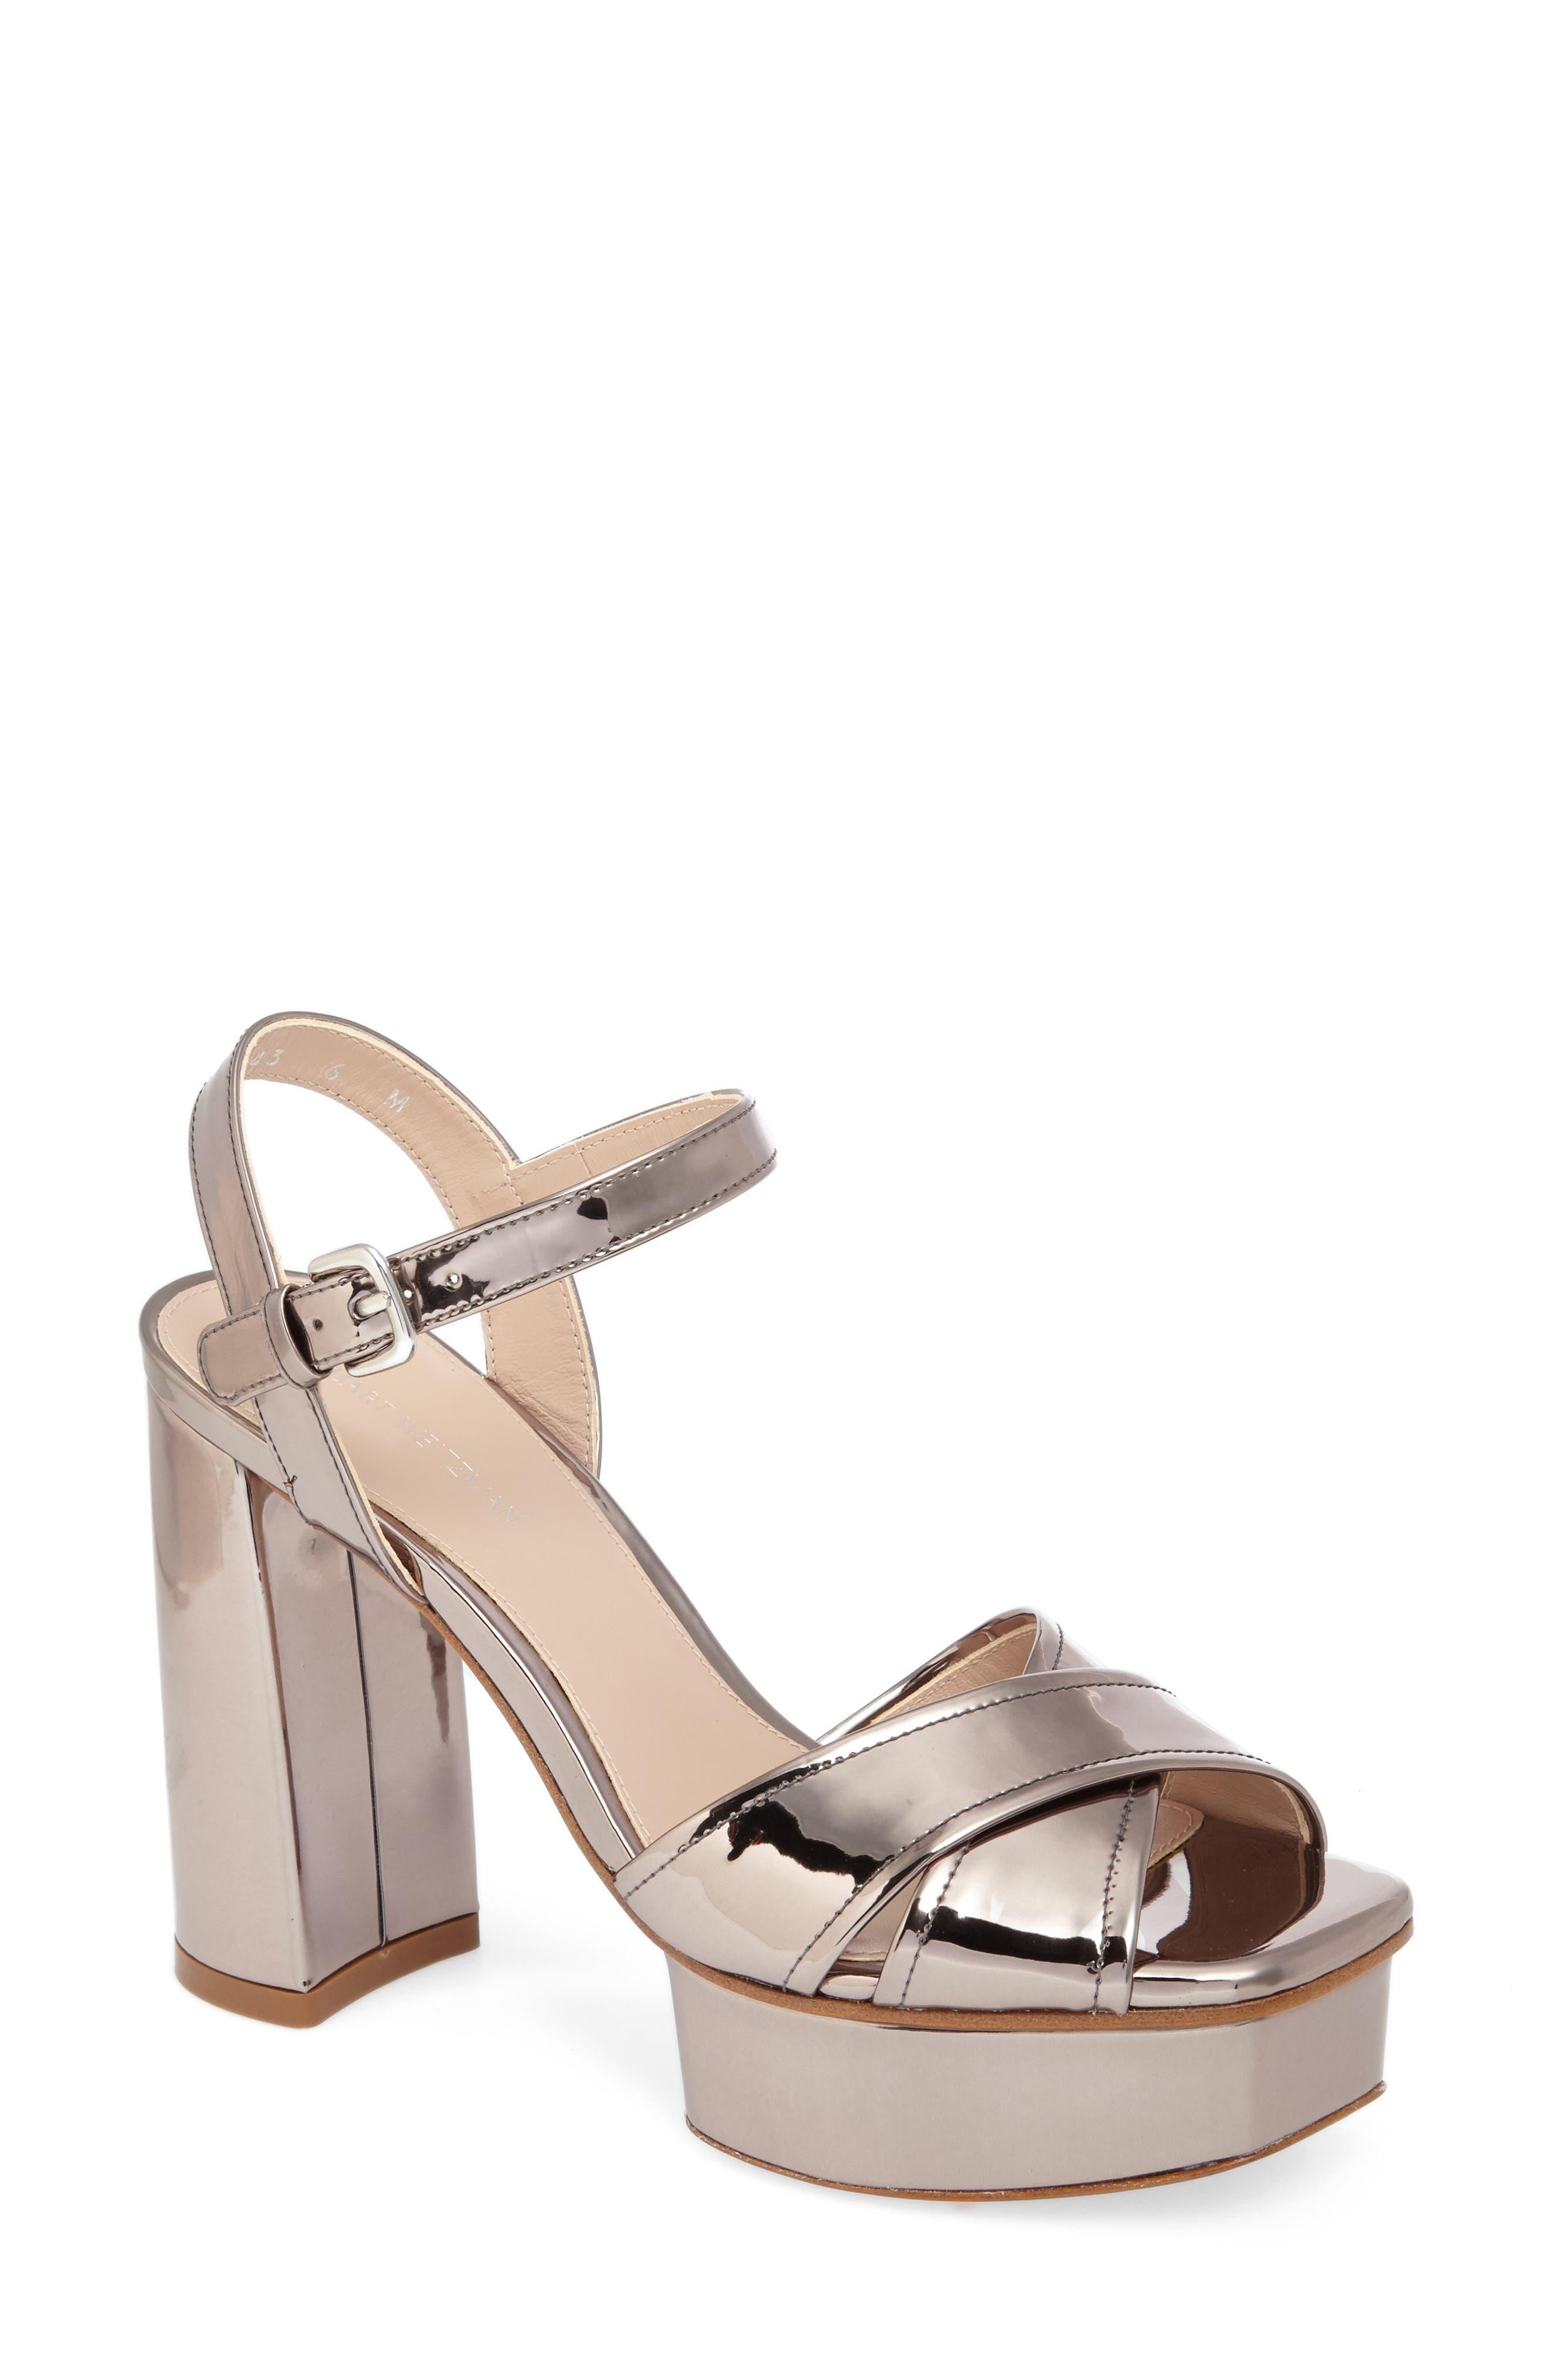 Alternate Image 1 Selected - Stuart Weitzman Exposed Platform Sandal (Women)